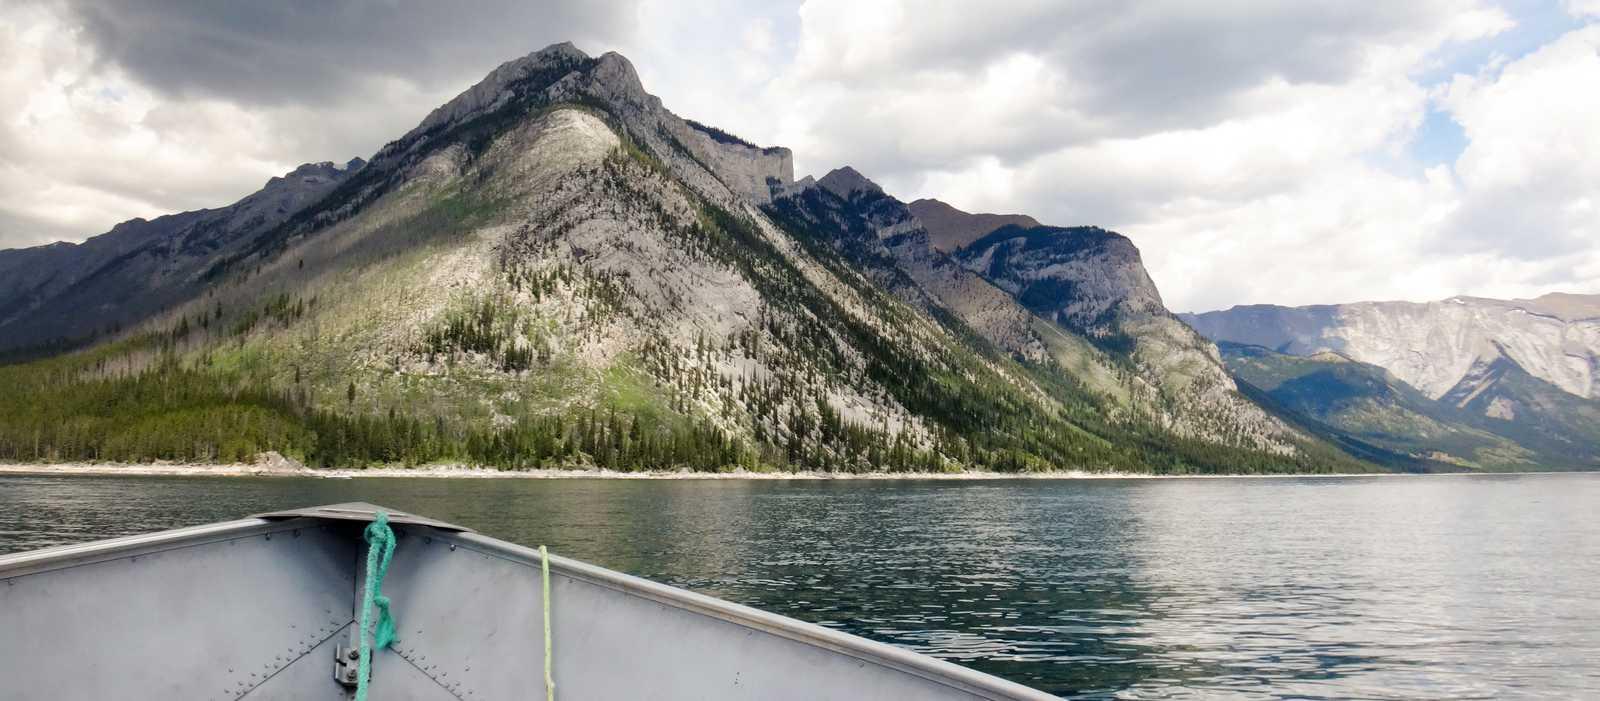 Bootstour auf dem Lake Minnewanka